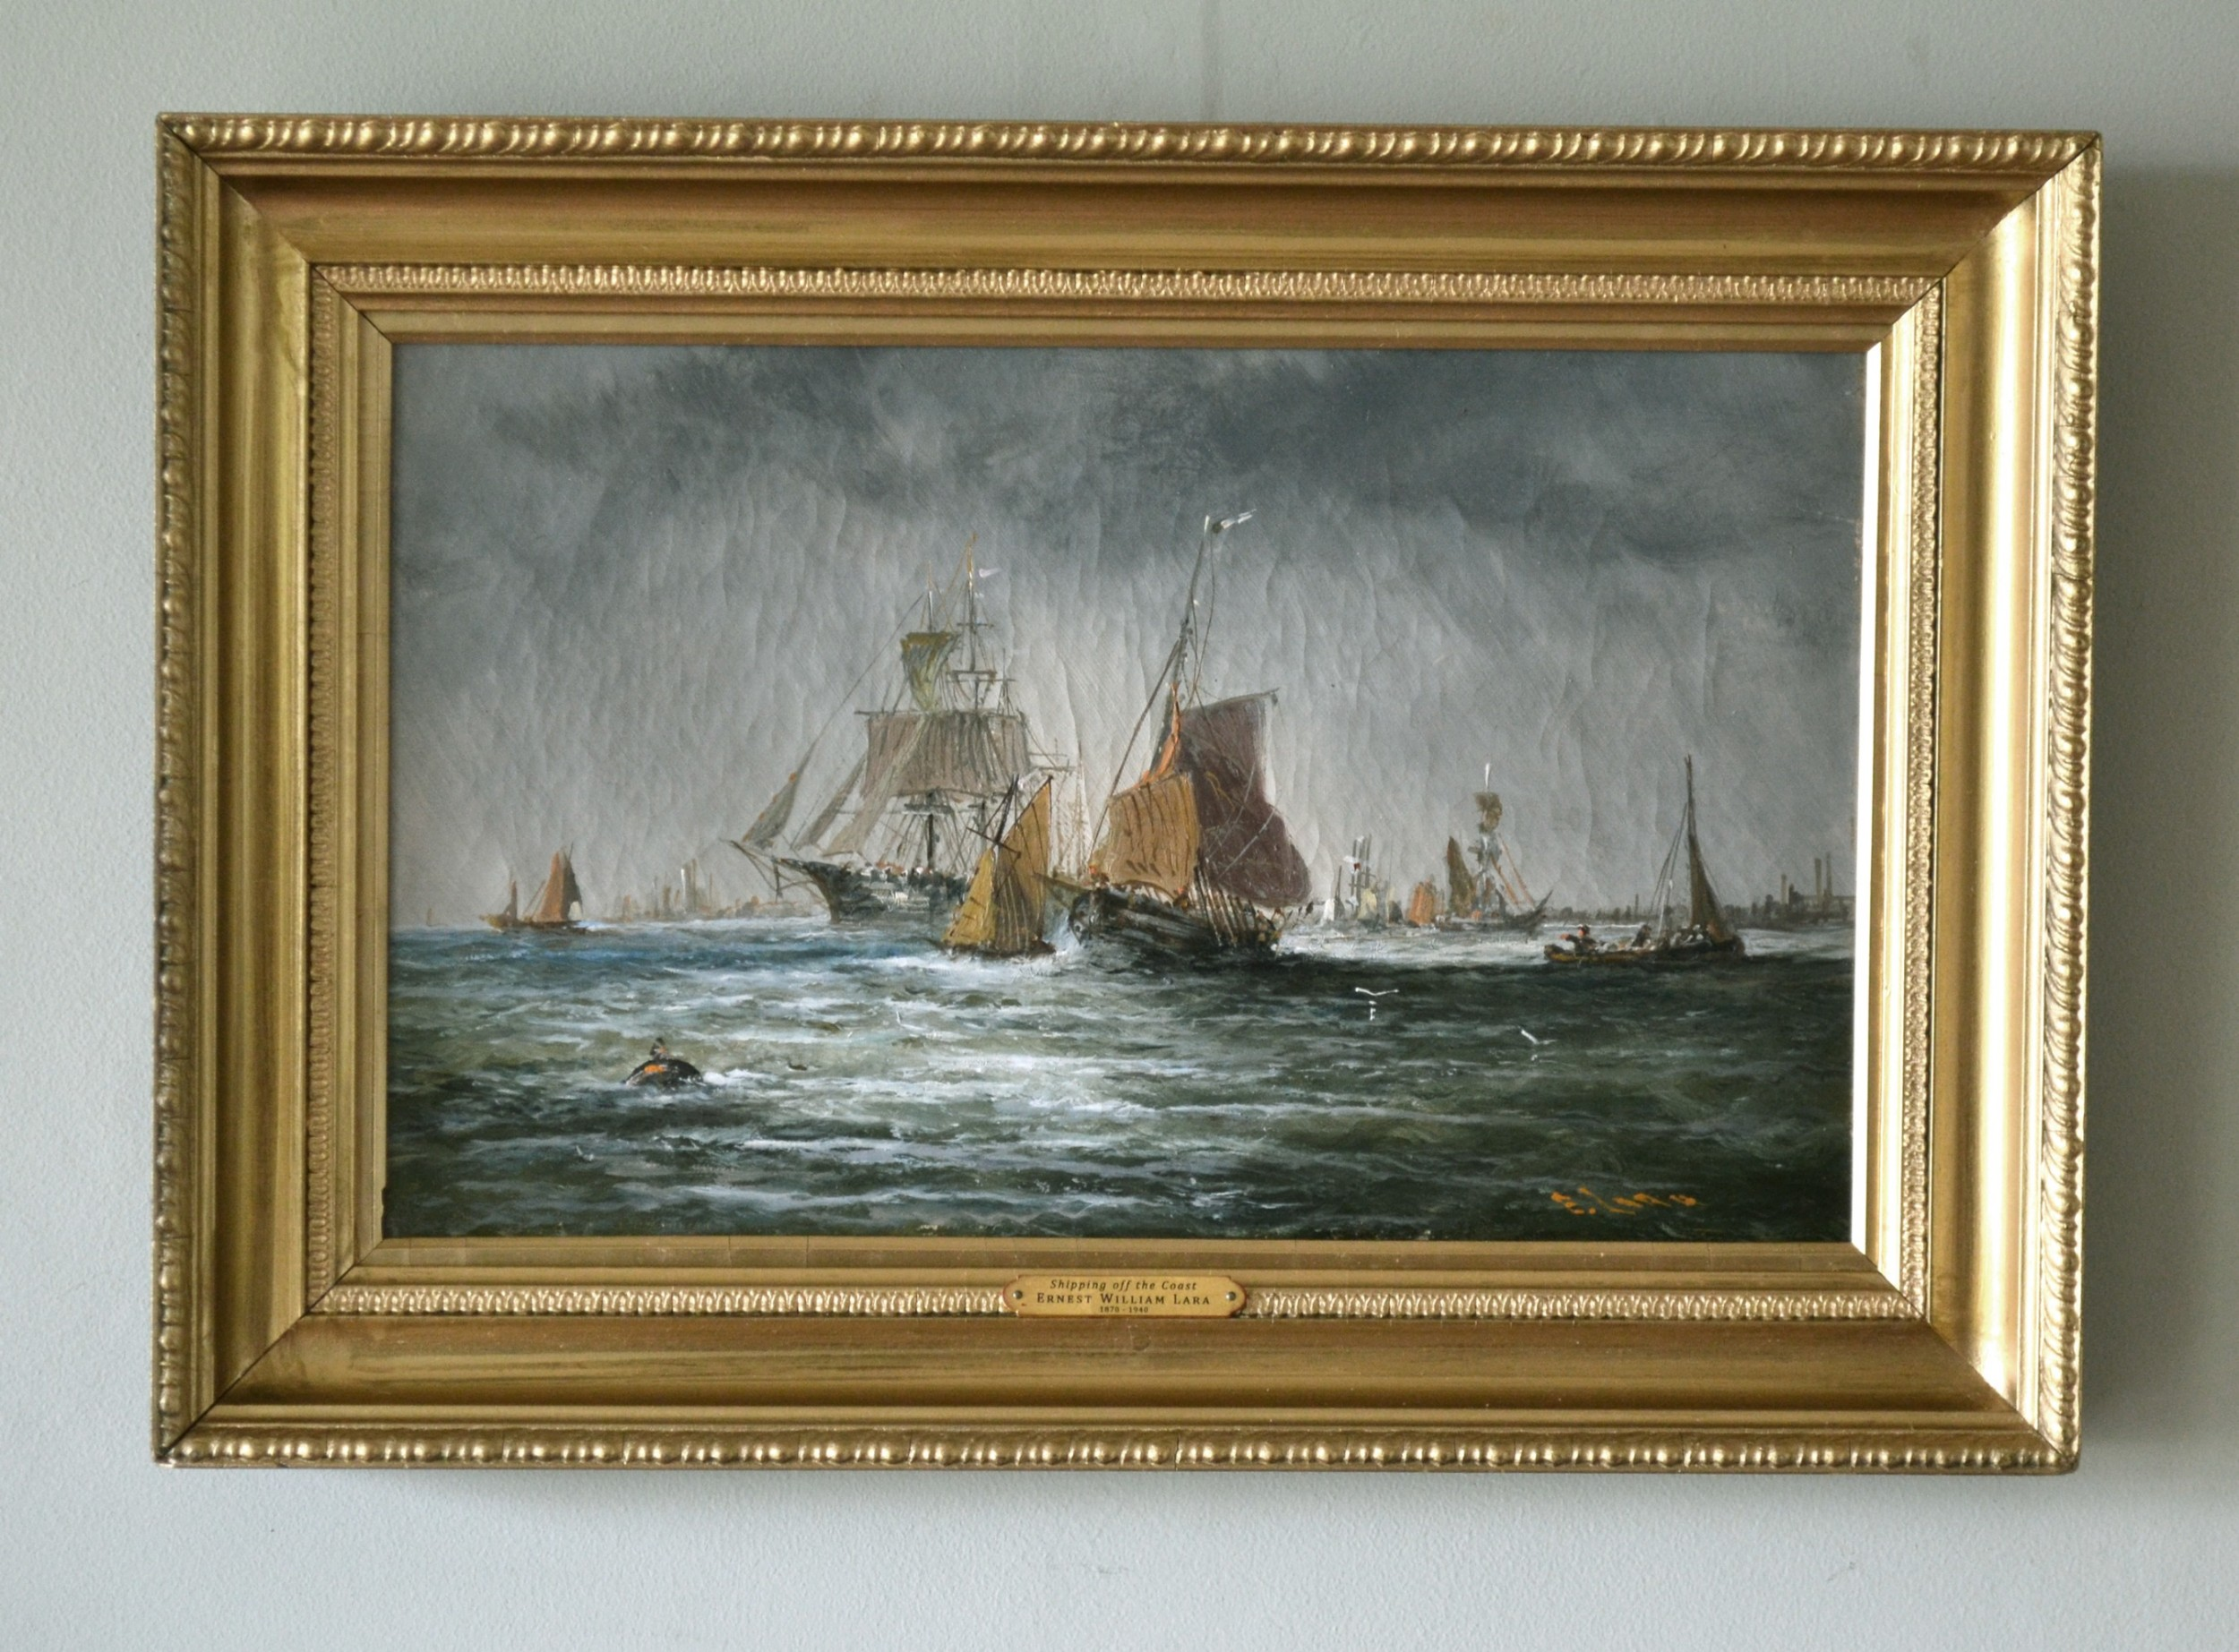 shipping off the coast c 1900 oil on canvas ernest william lara 18701940